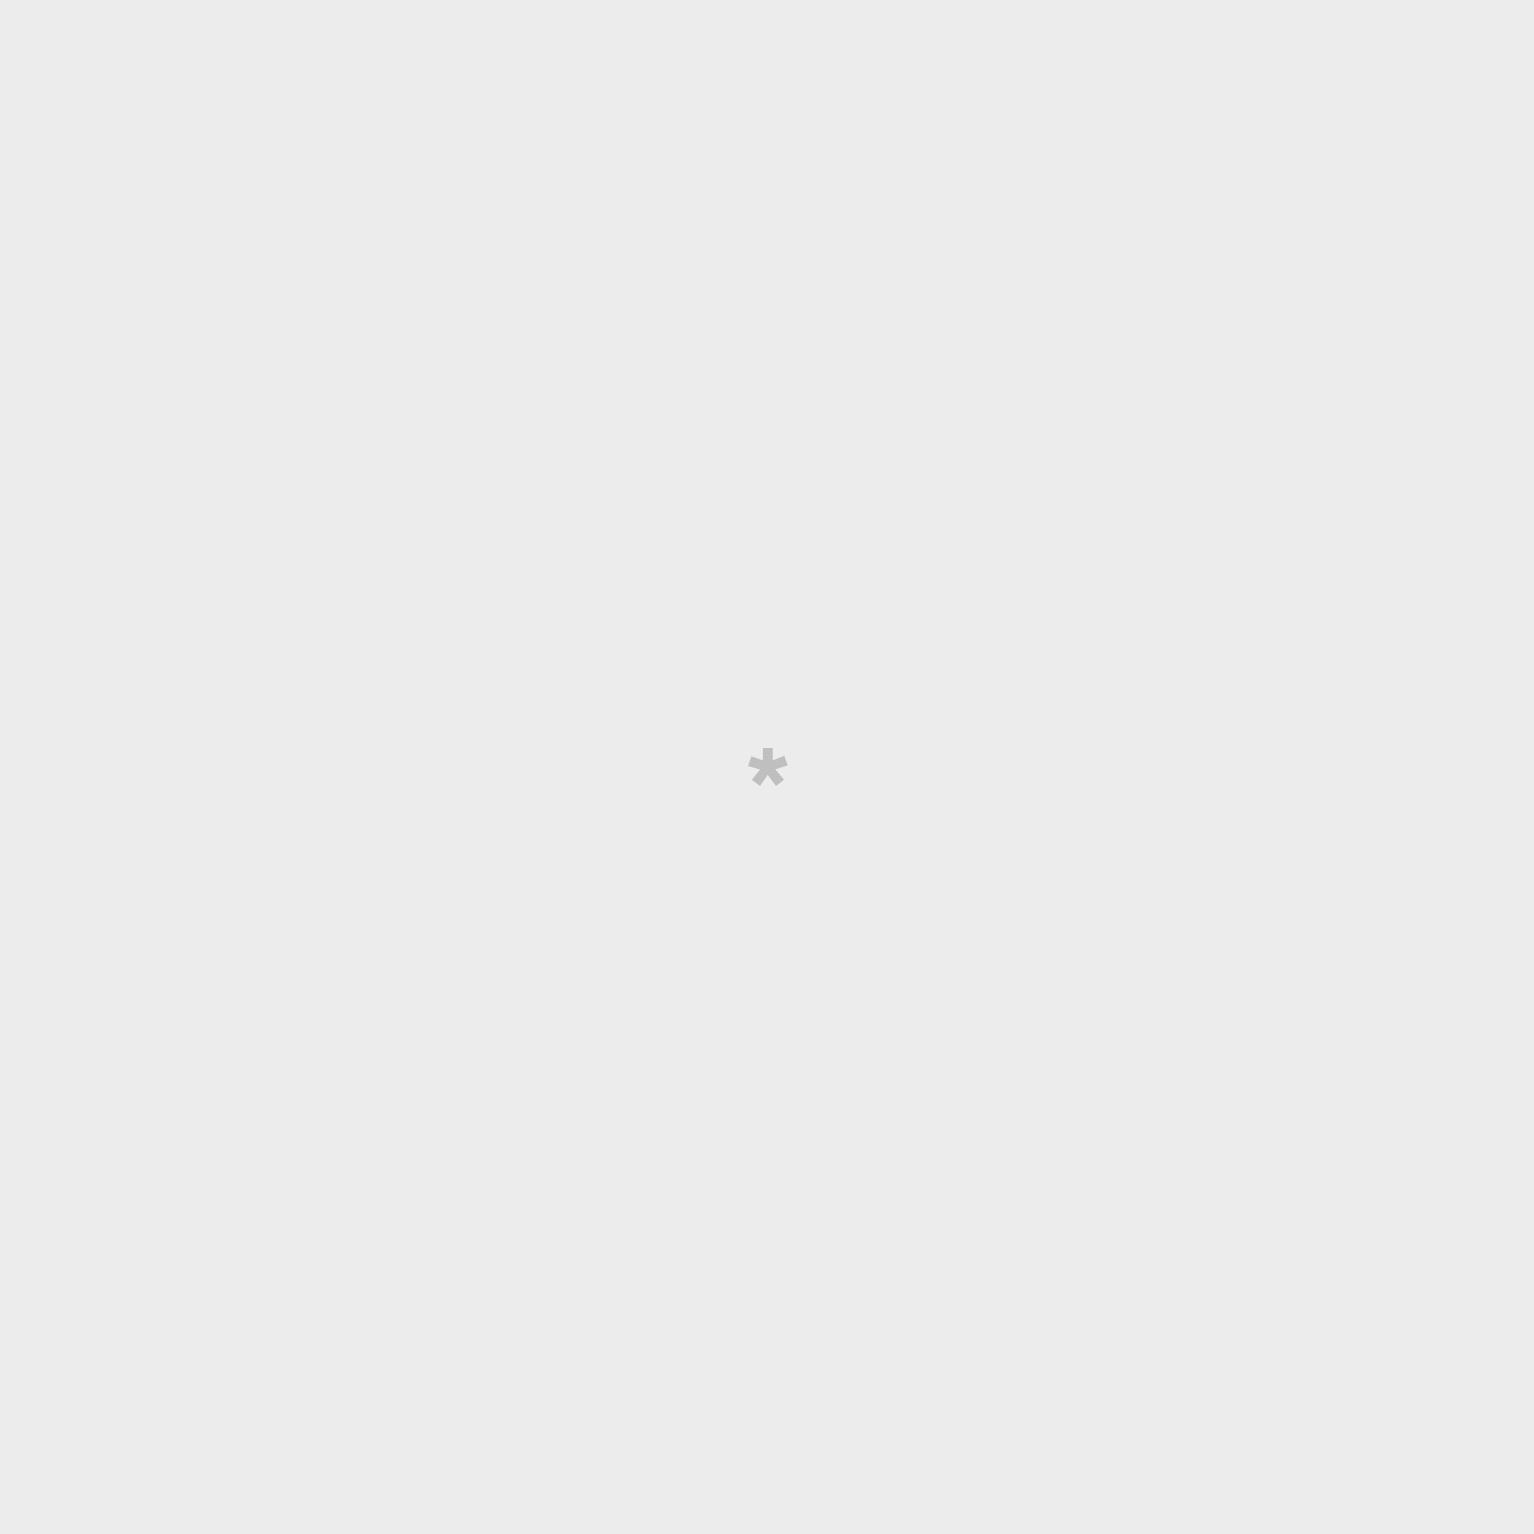 Álbum de fotos para bebé rosa - Momentazos de la estrella de la casa